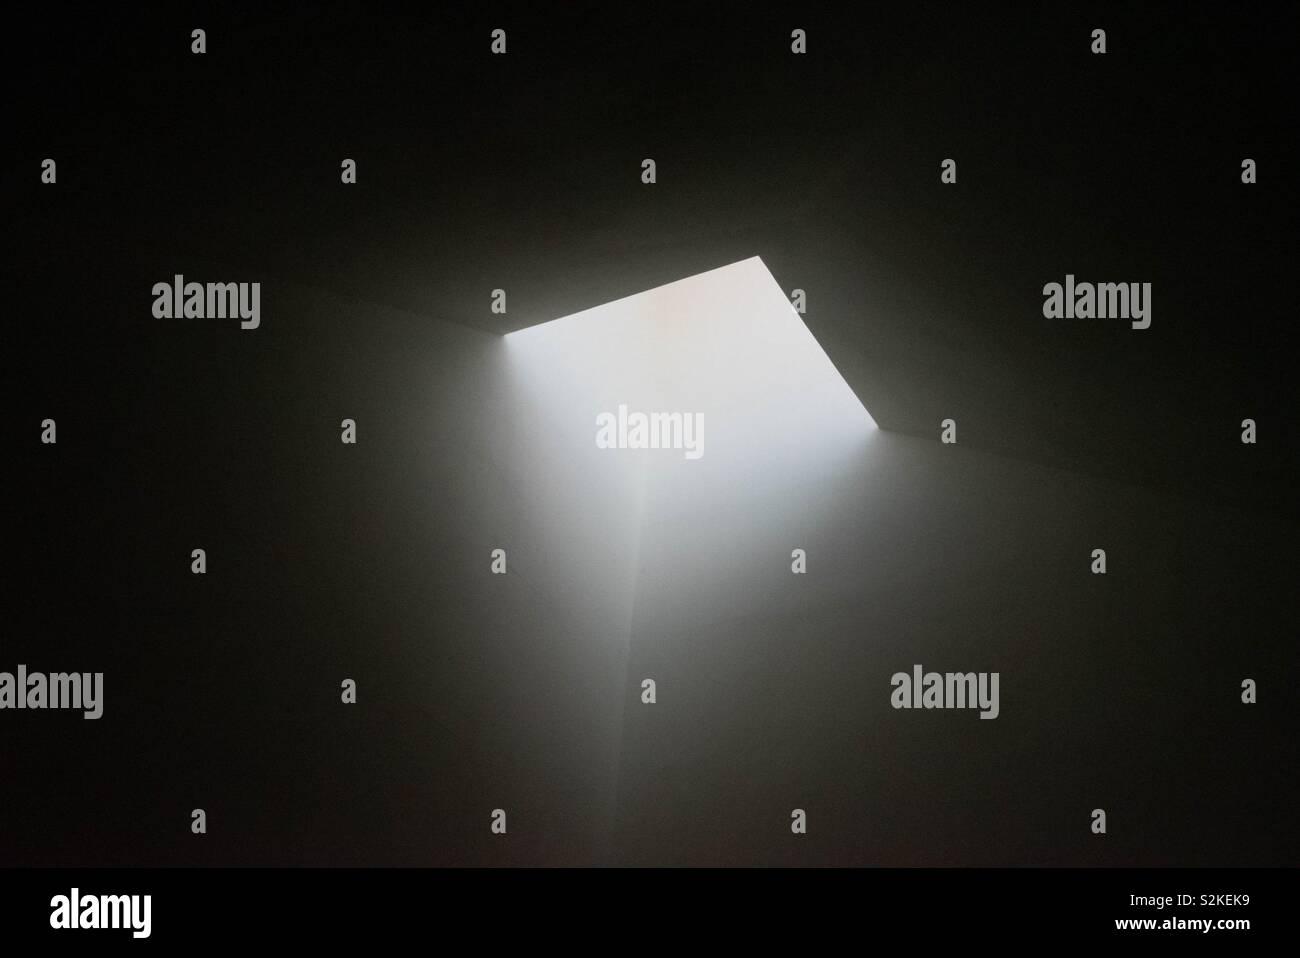 Godly light? - Stock Image